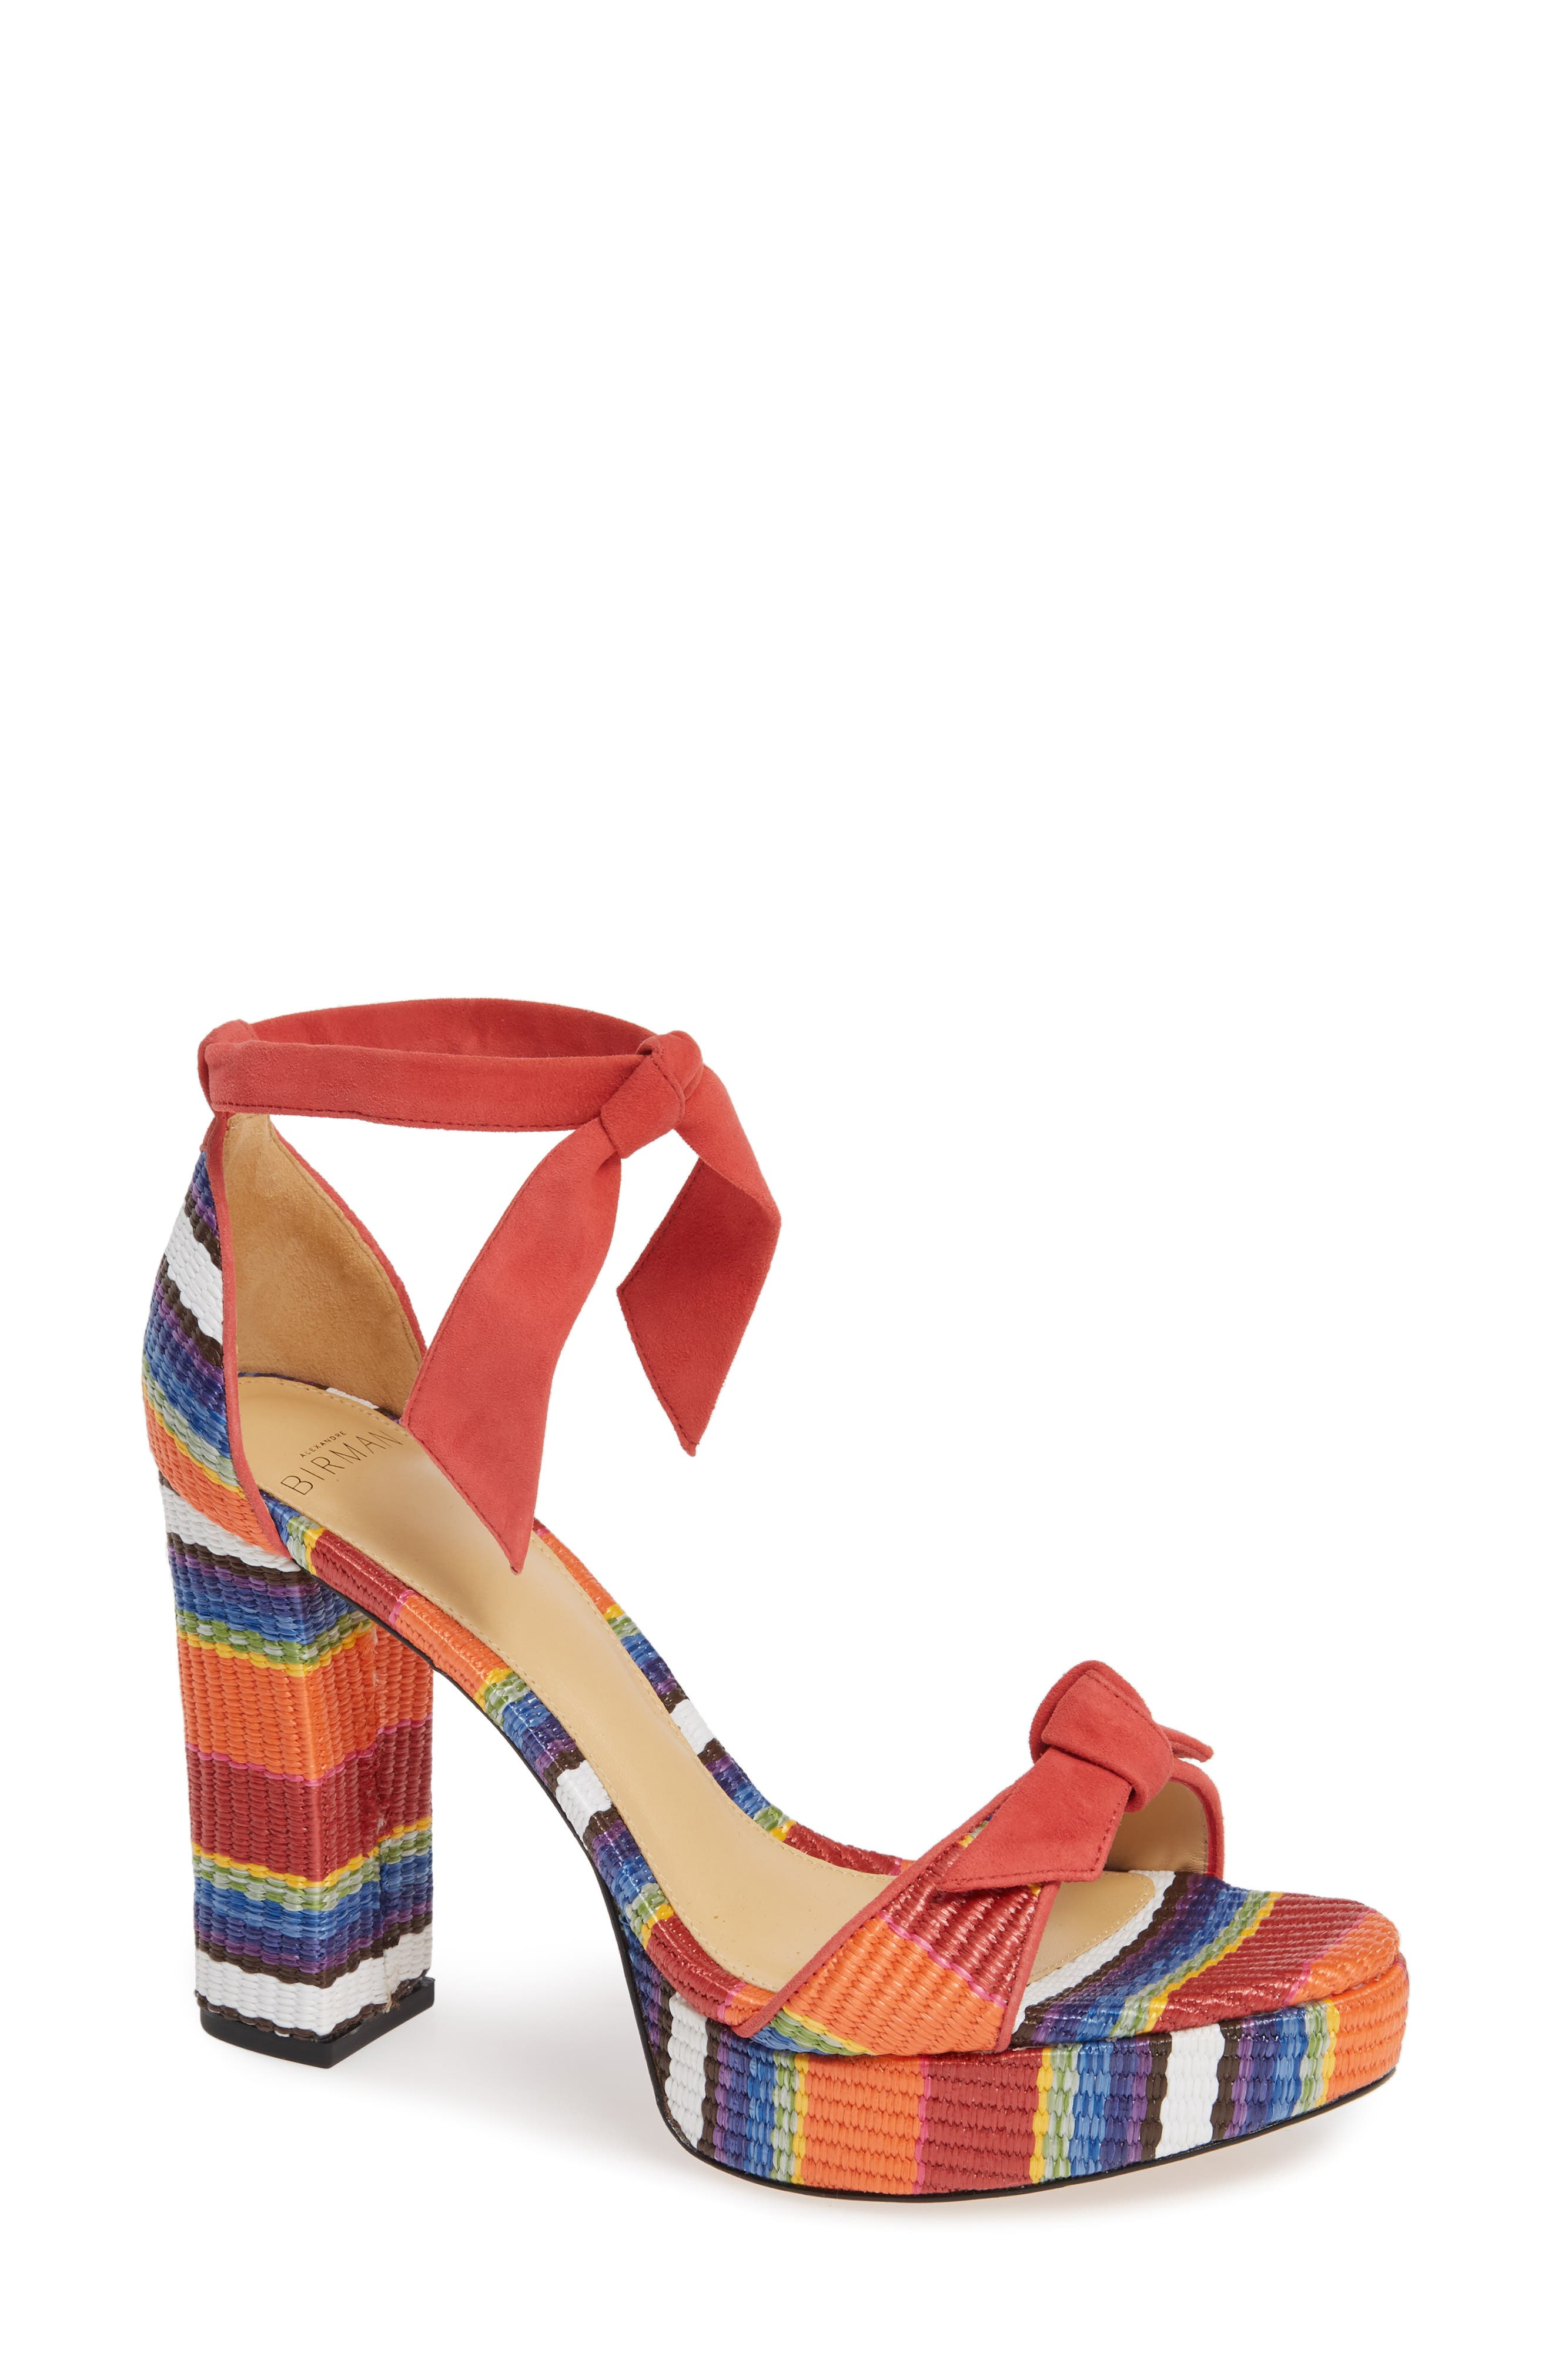 ALEXANDRE BIRMAN Clarita Platform Sandal, Main, color, CORAL MULTI